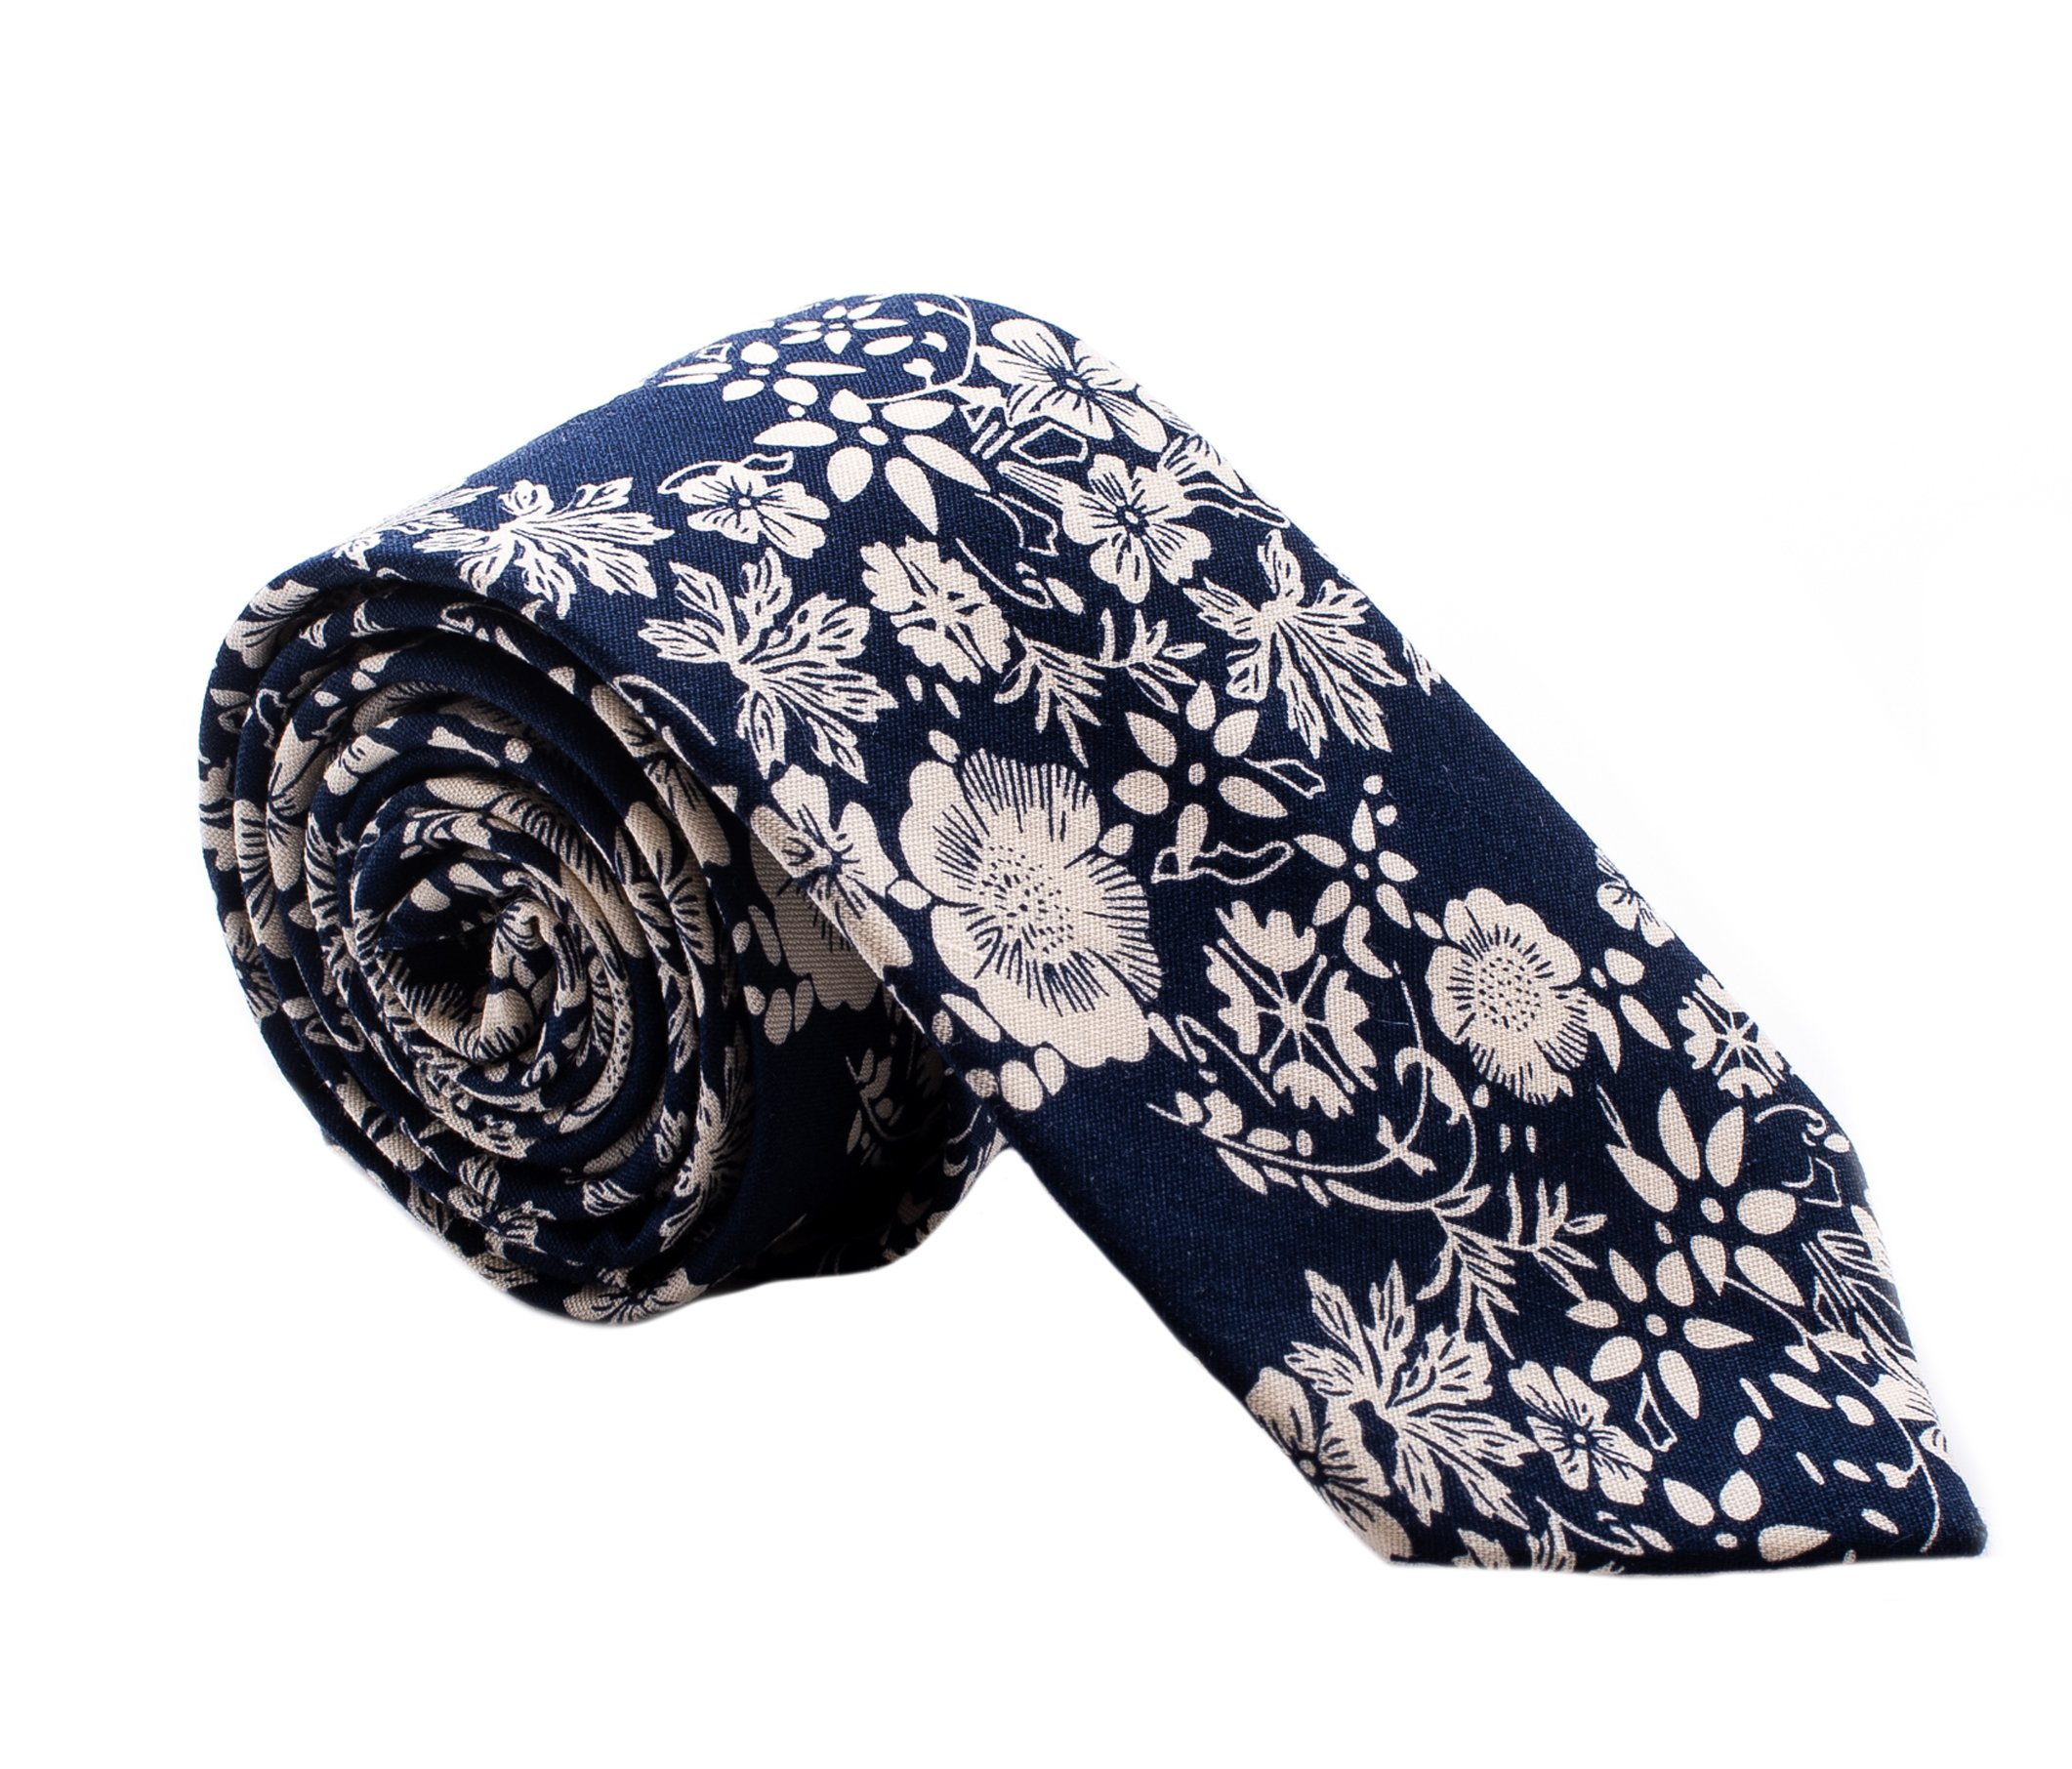 Tie - Floral - Navy Blue